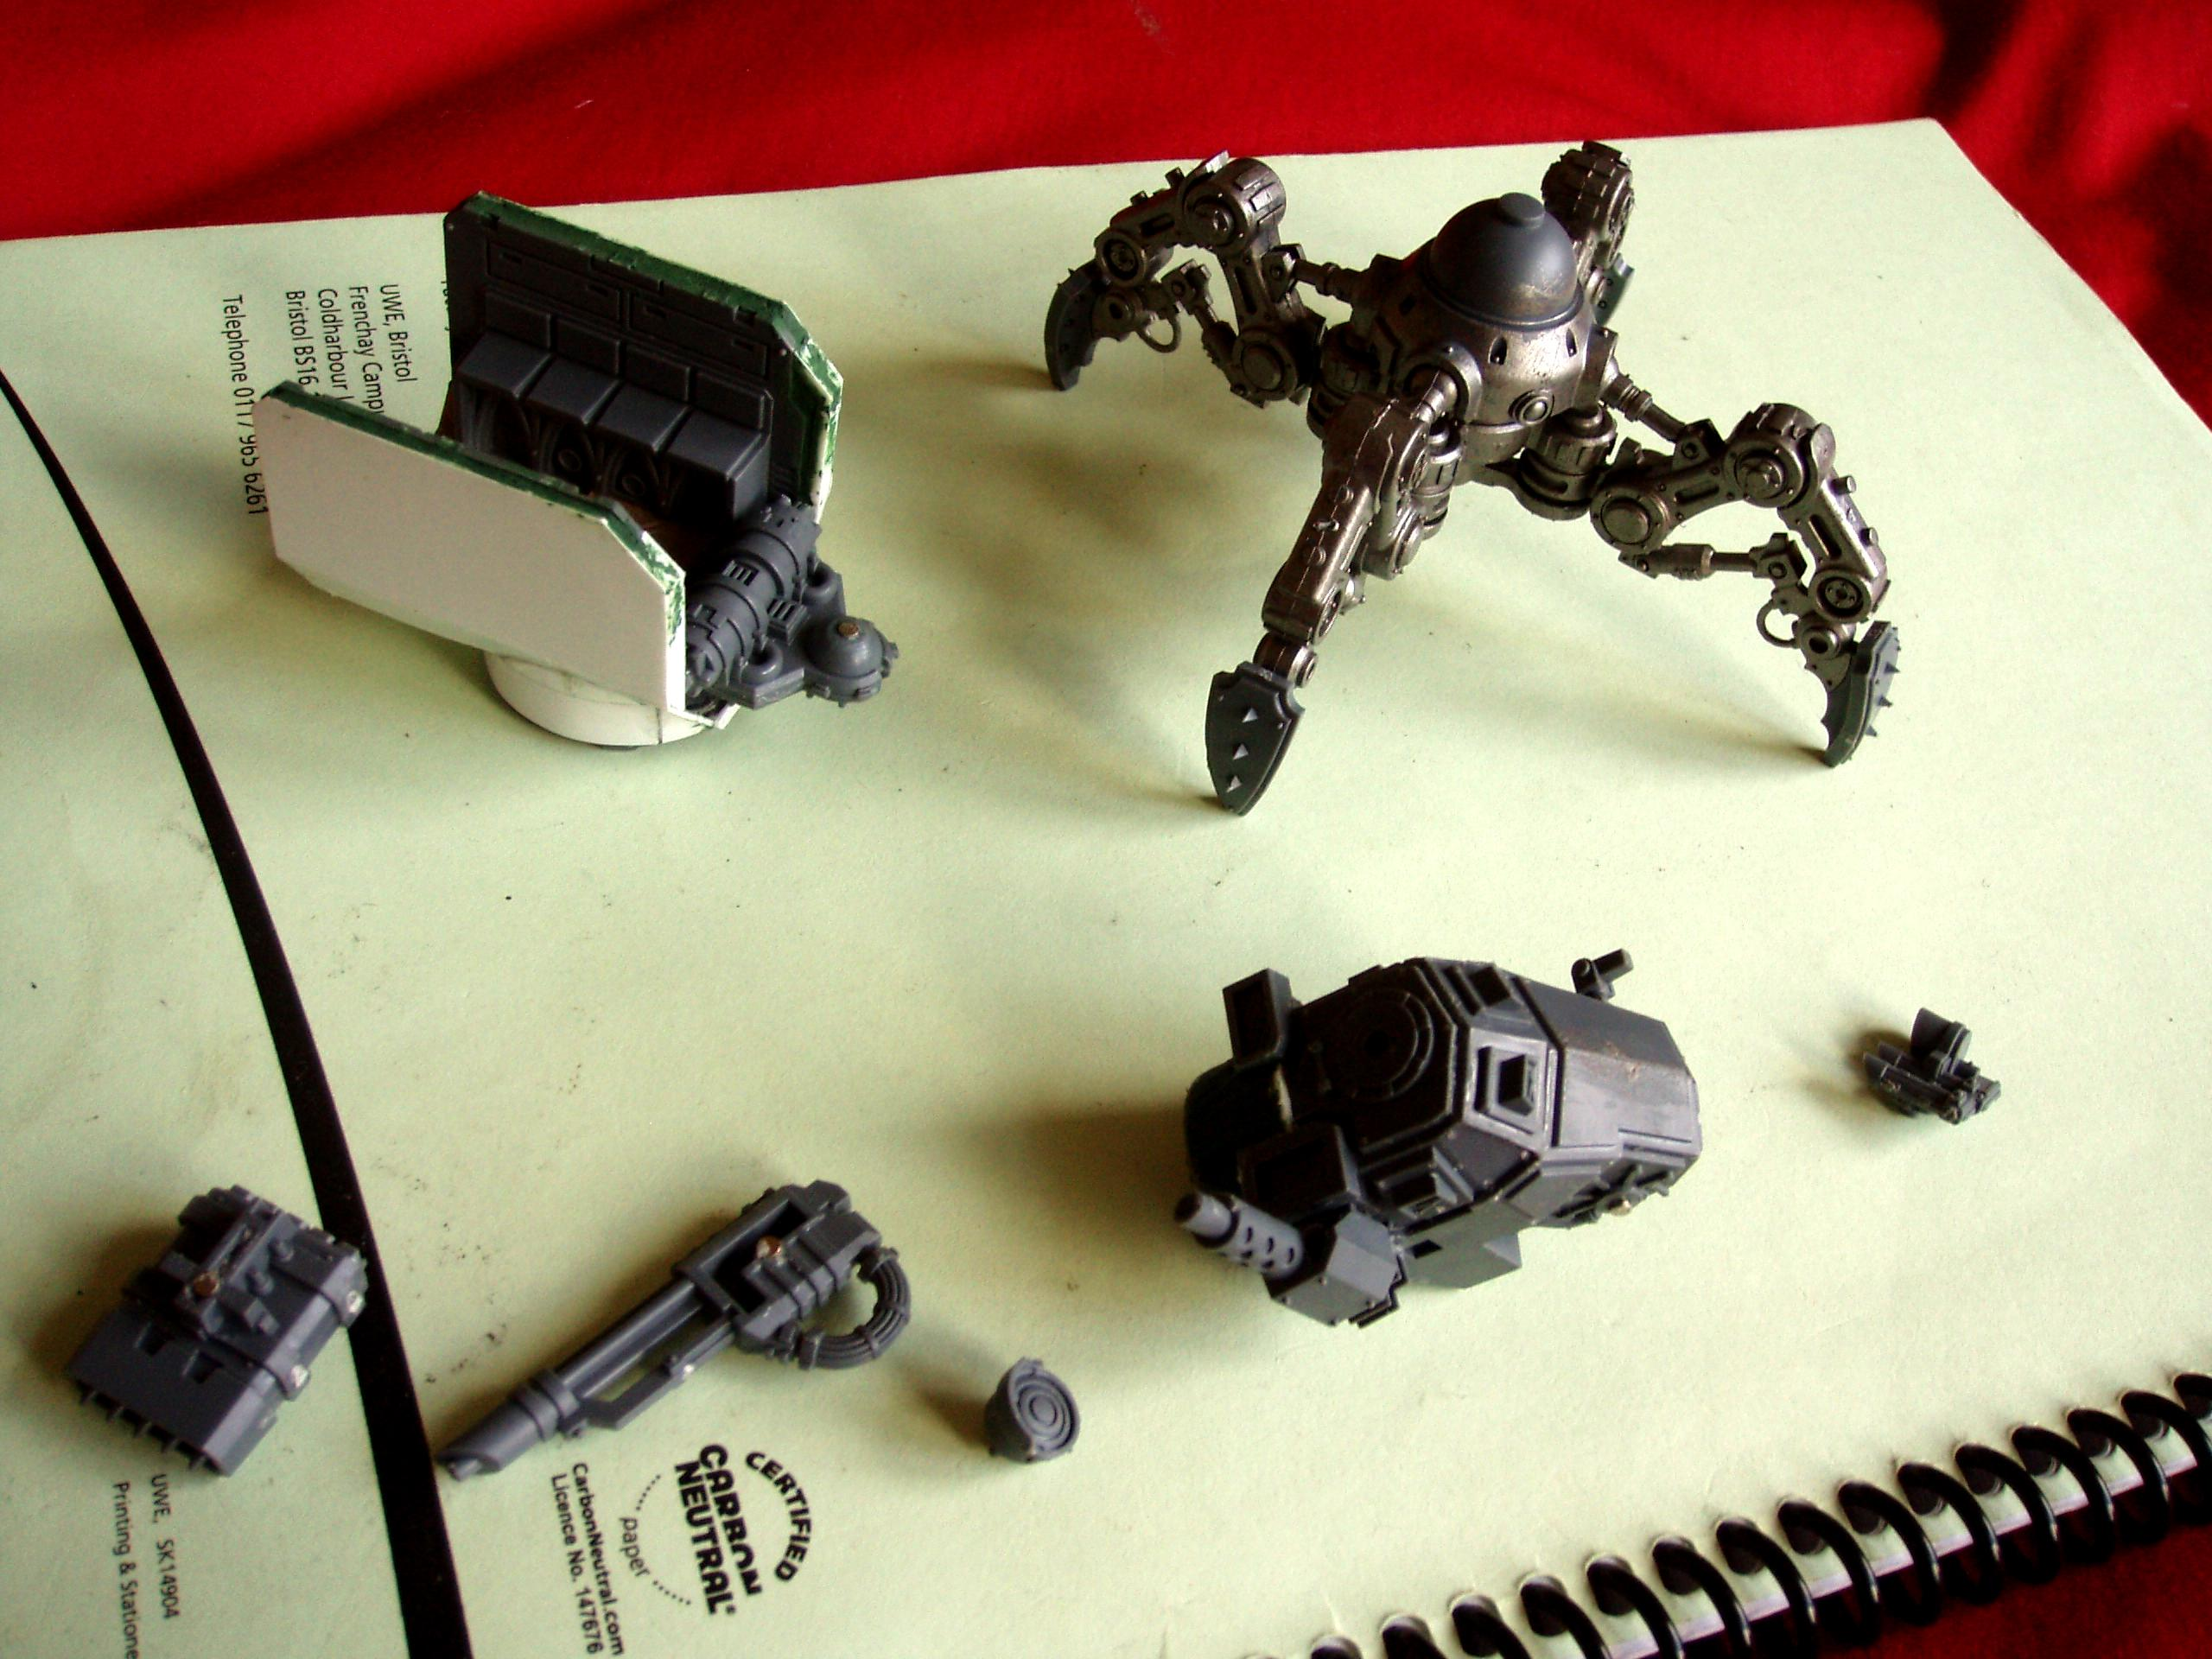 40k Mule, Mars Universal Land Engine Ordo Reductor, Mechanicum, Mechanicus, Mule, Onager, Skitarii